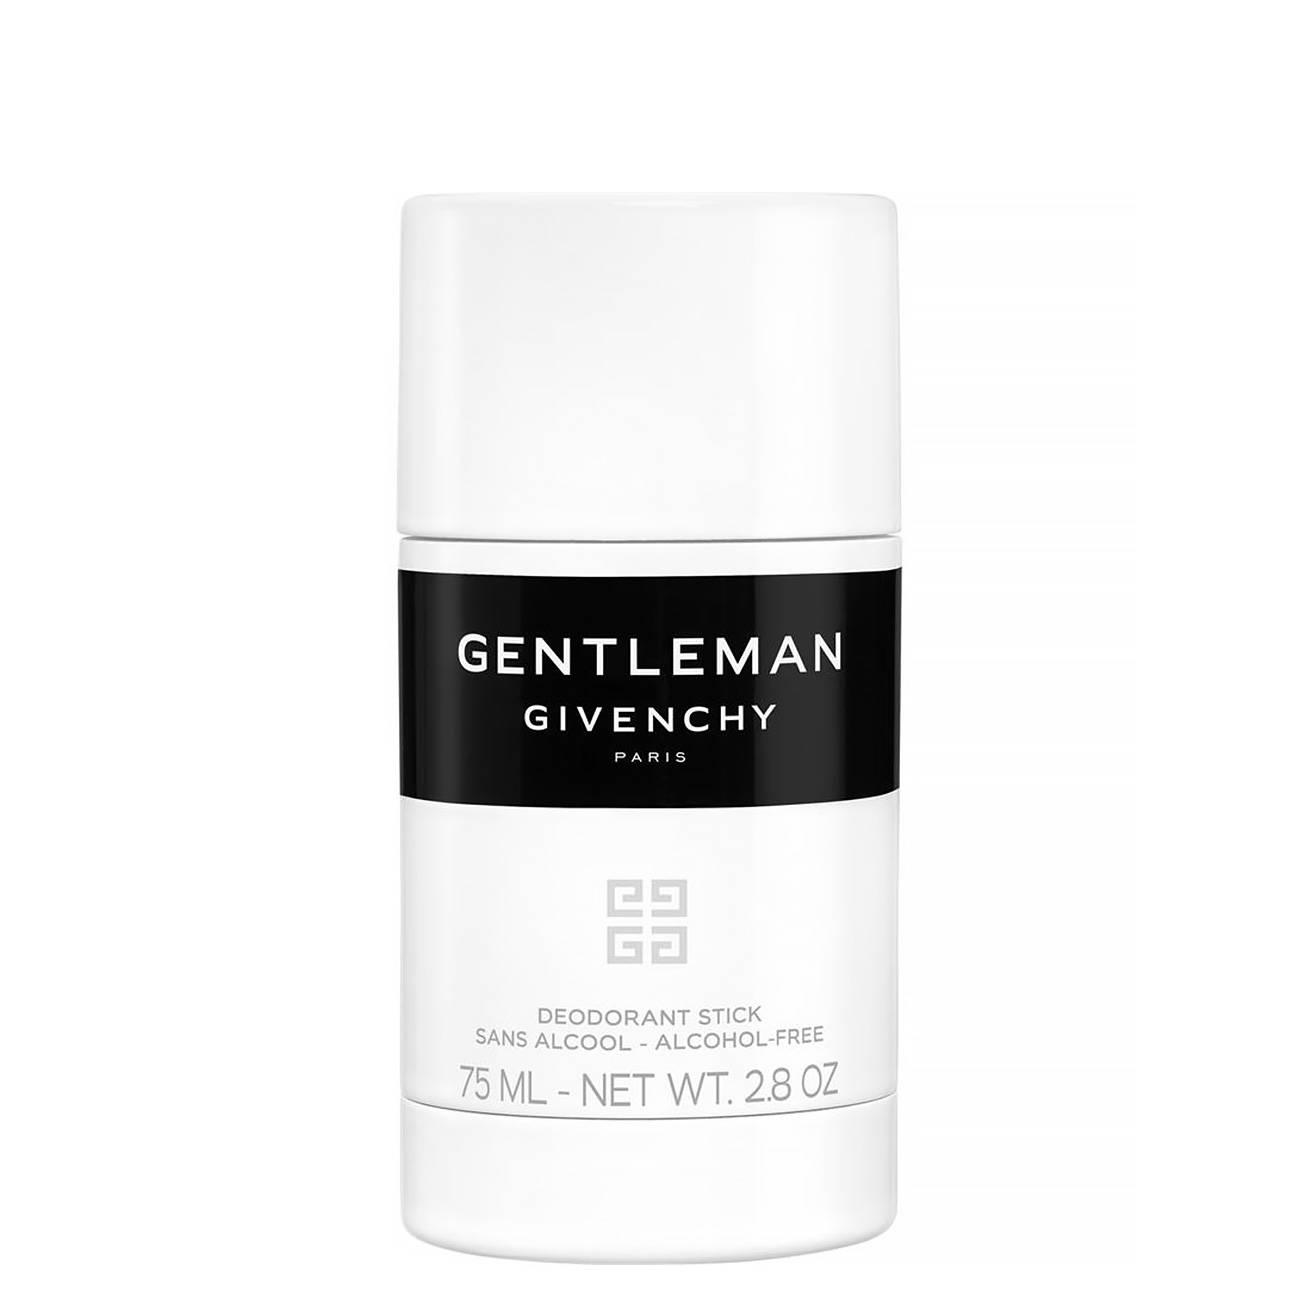 Gentleman Deodorant Stick 75ml Givenchy imagine 2021 bestvalue.eu